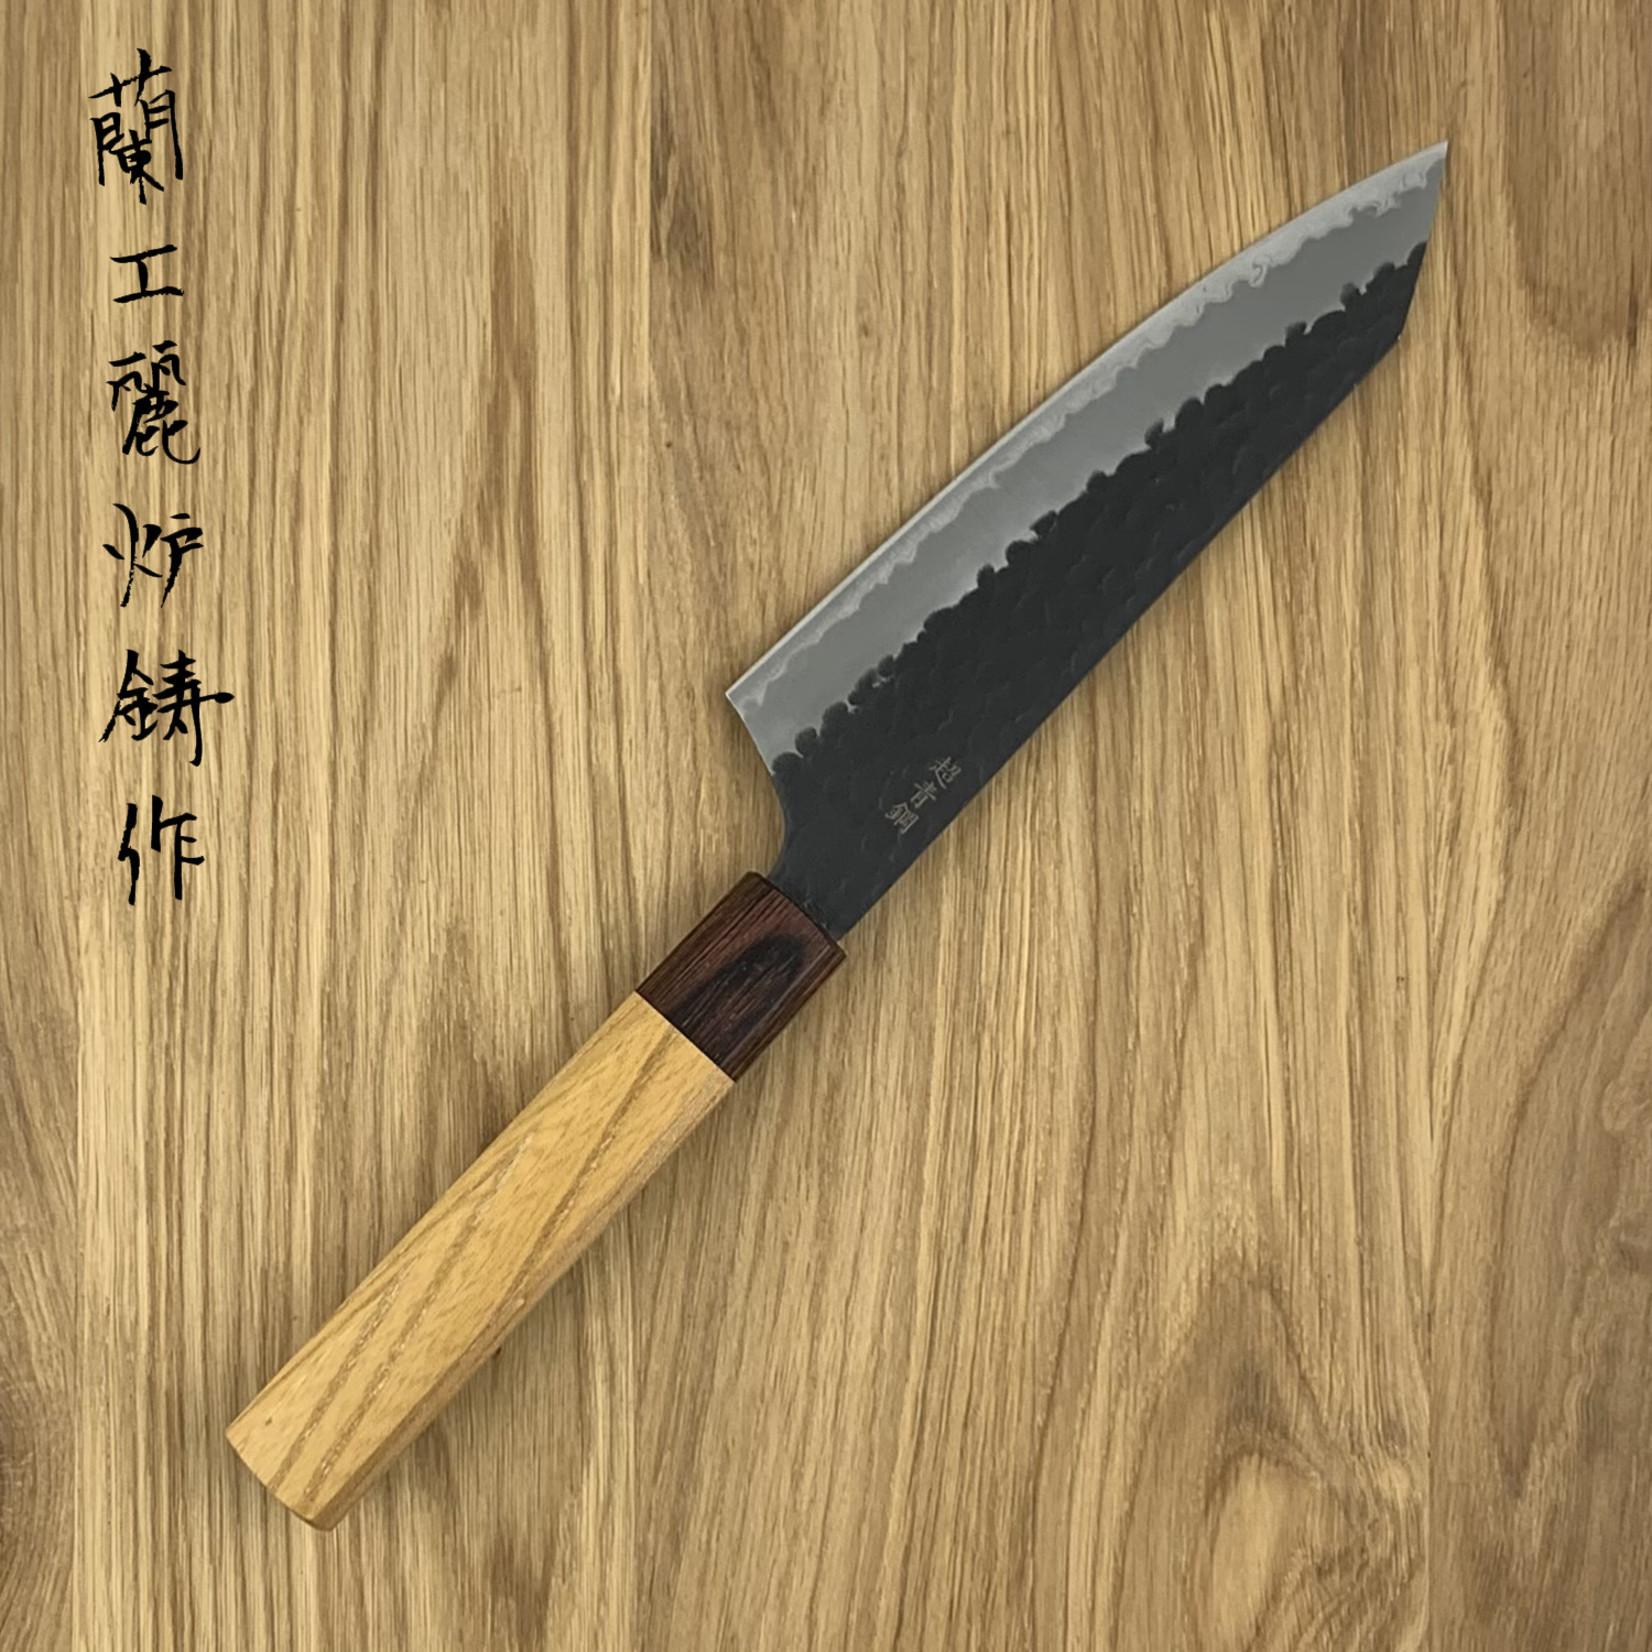 SAKAI TAKAYUKI Kengata 160 mm 3 laags gehamerd AS+ Zelkova 01191